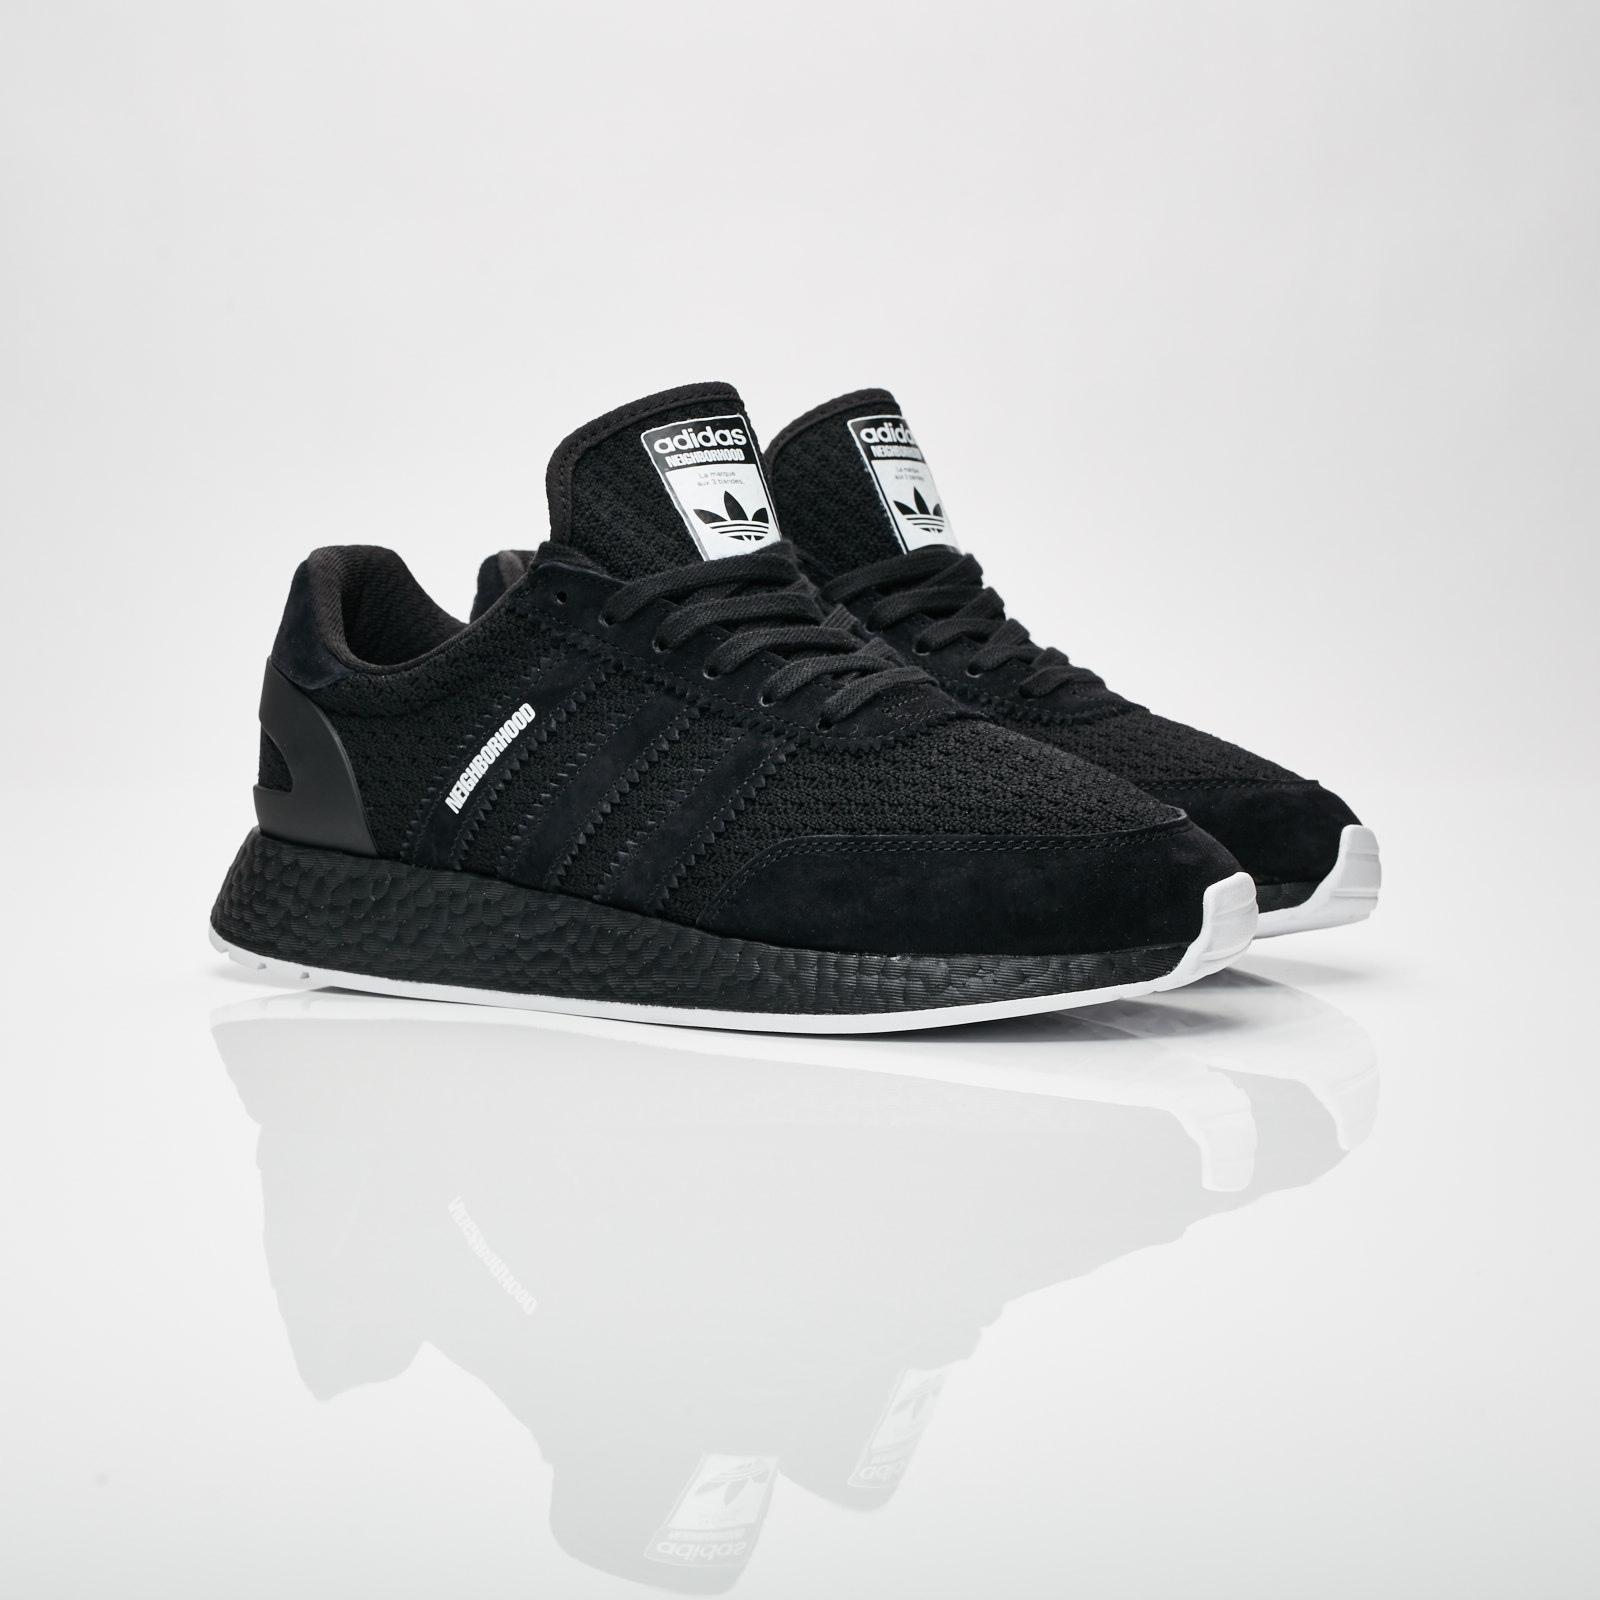 elige lo último diseño de moda mejores telas adidas I-5923 x Neighborhood - Da8838 - Sneakersnstuff   sneakers ...